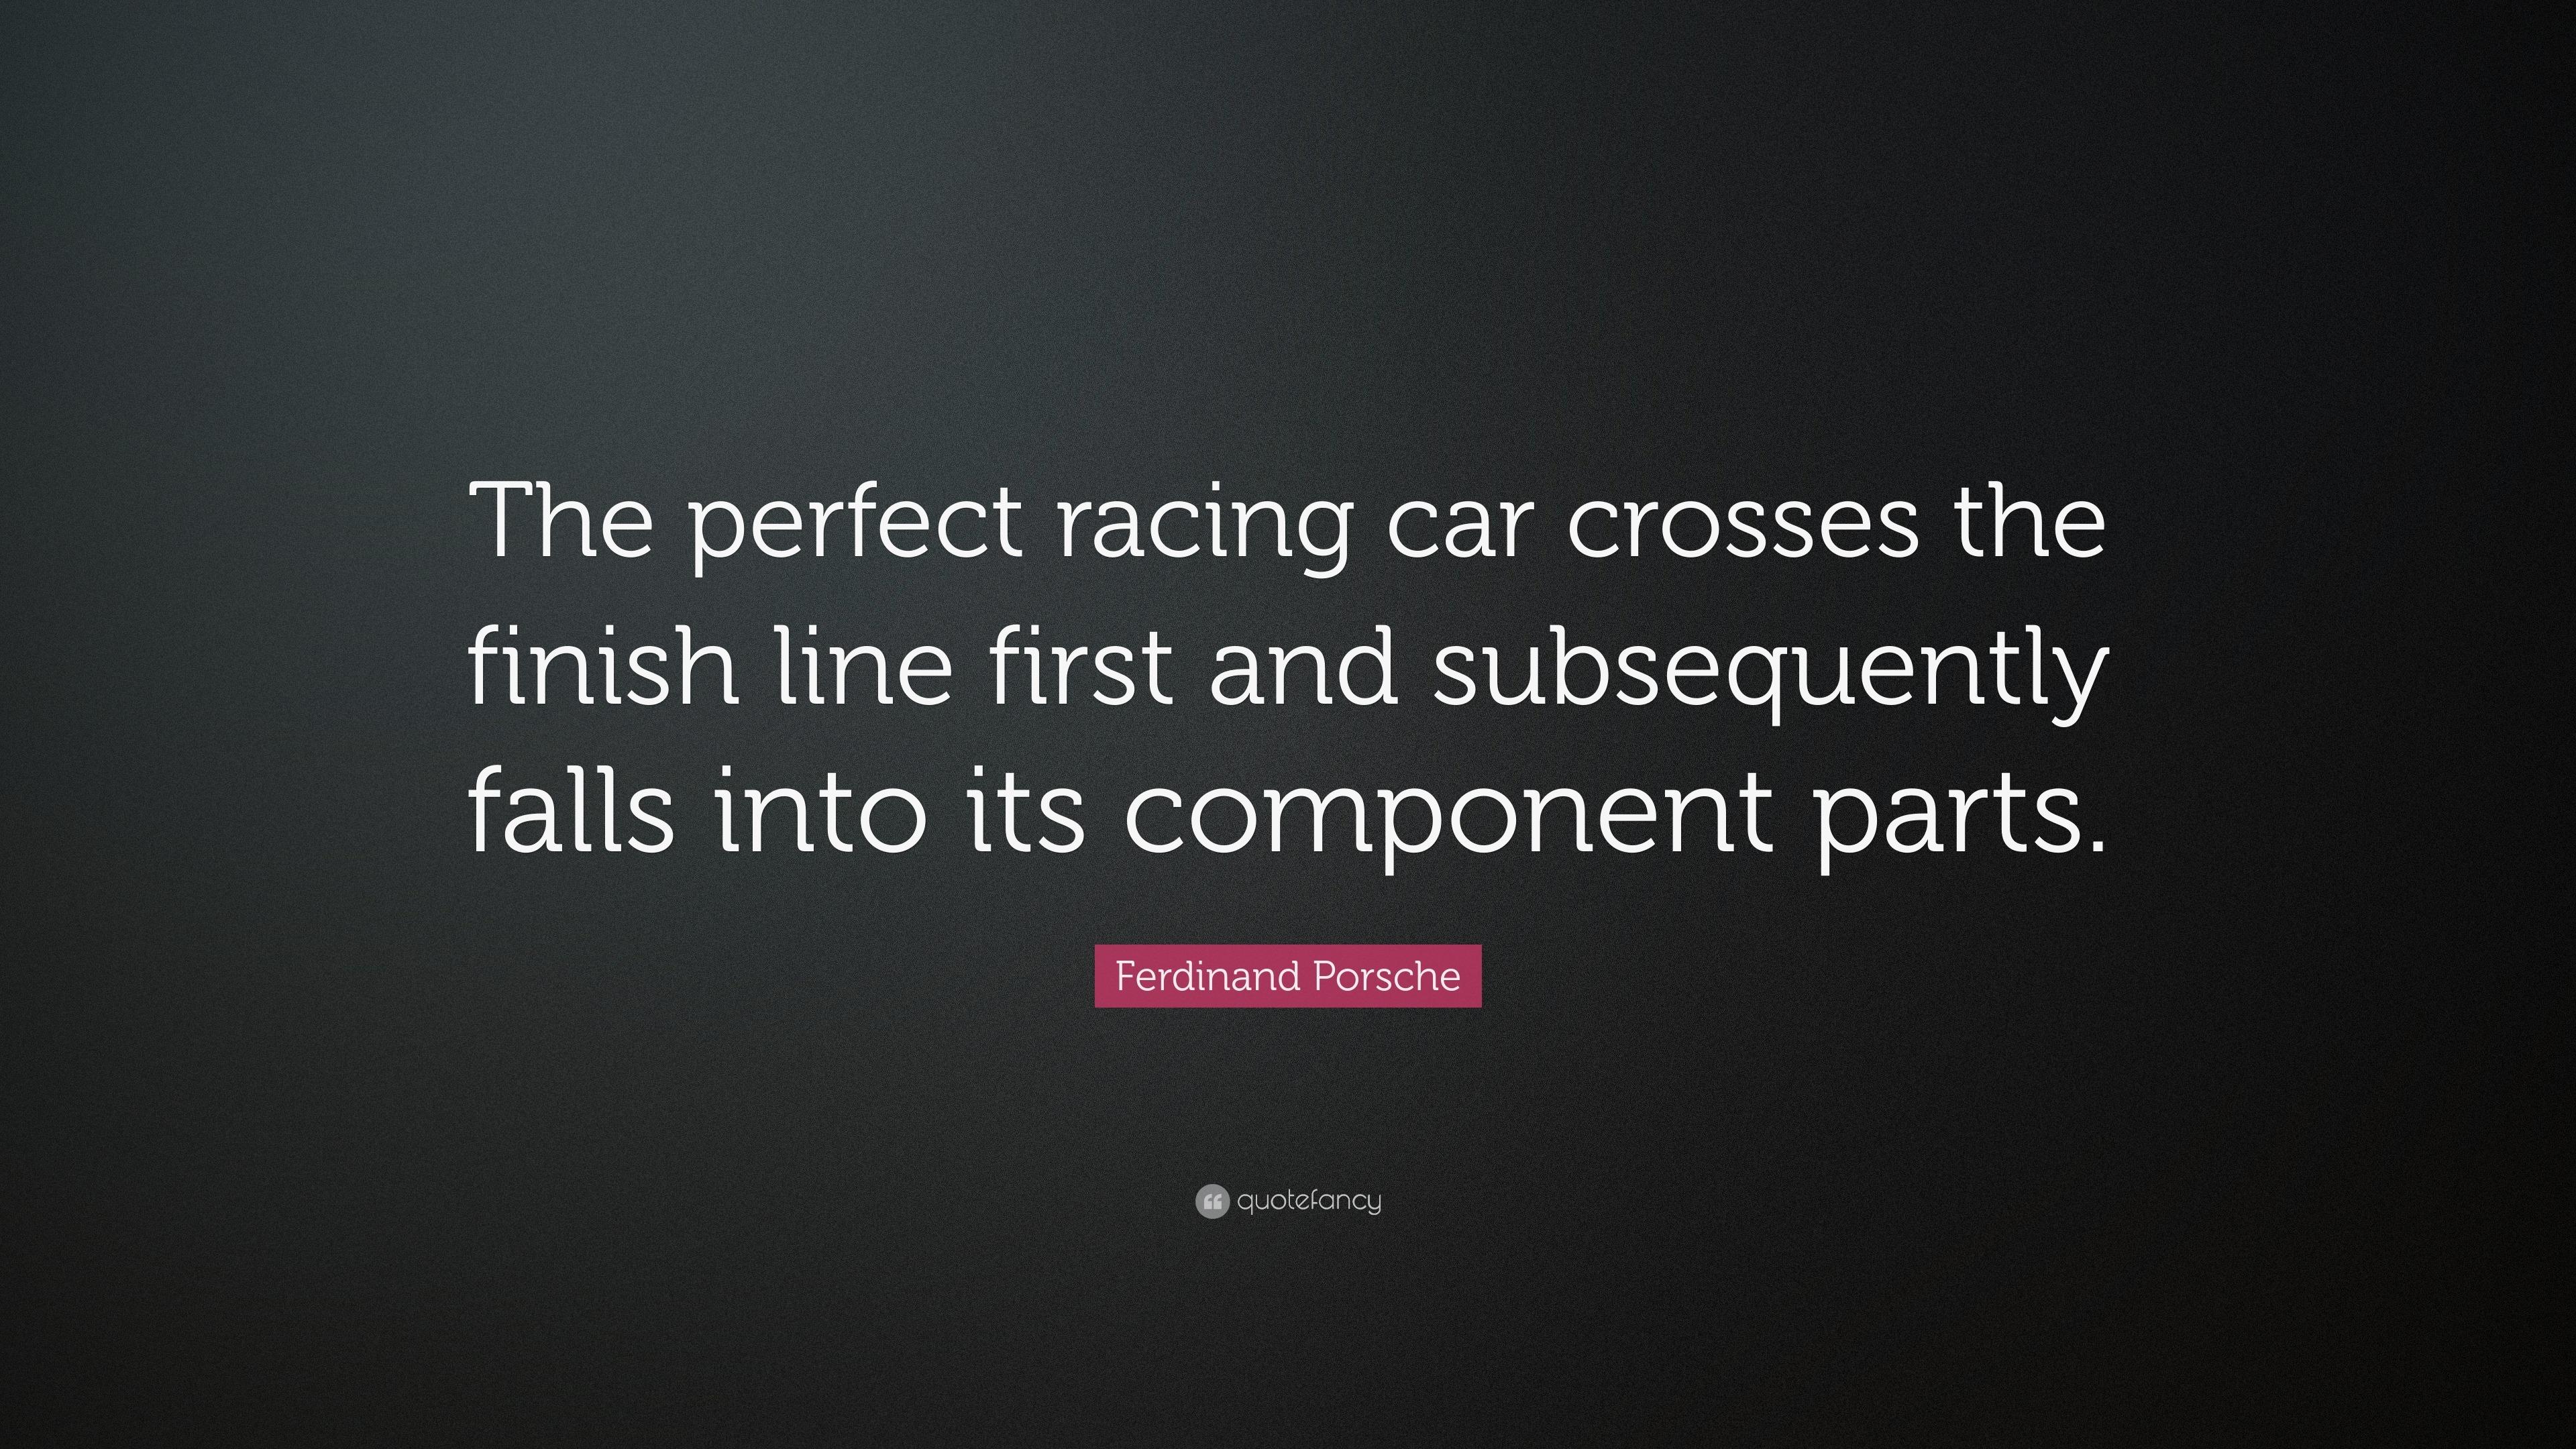 Ferdinand Porsche Quote \u201cThe perfect racing car crosses the